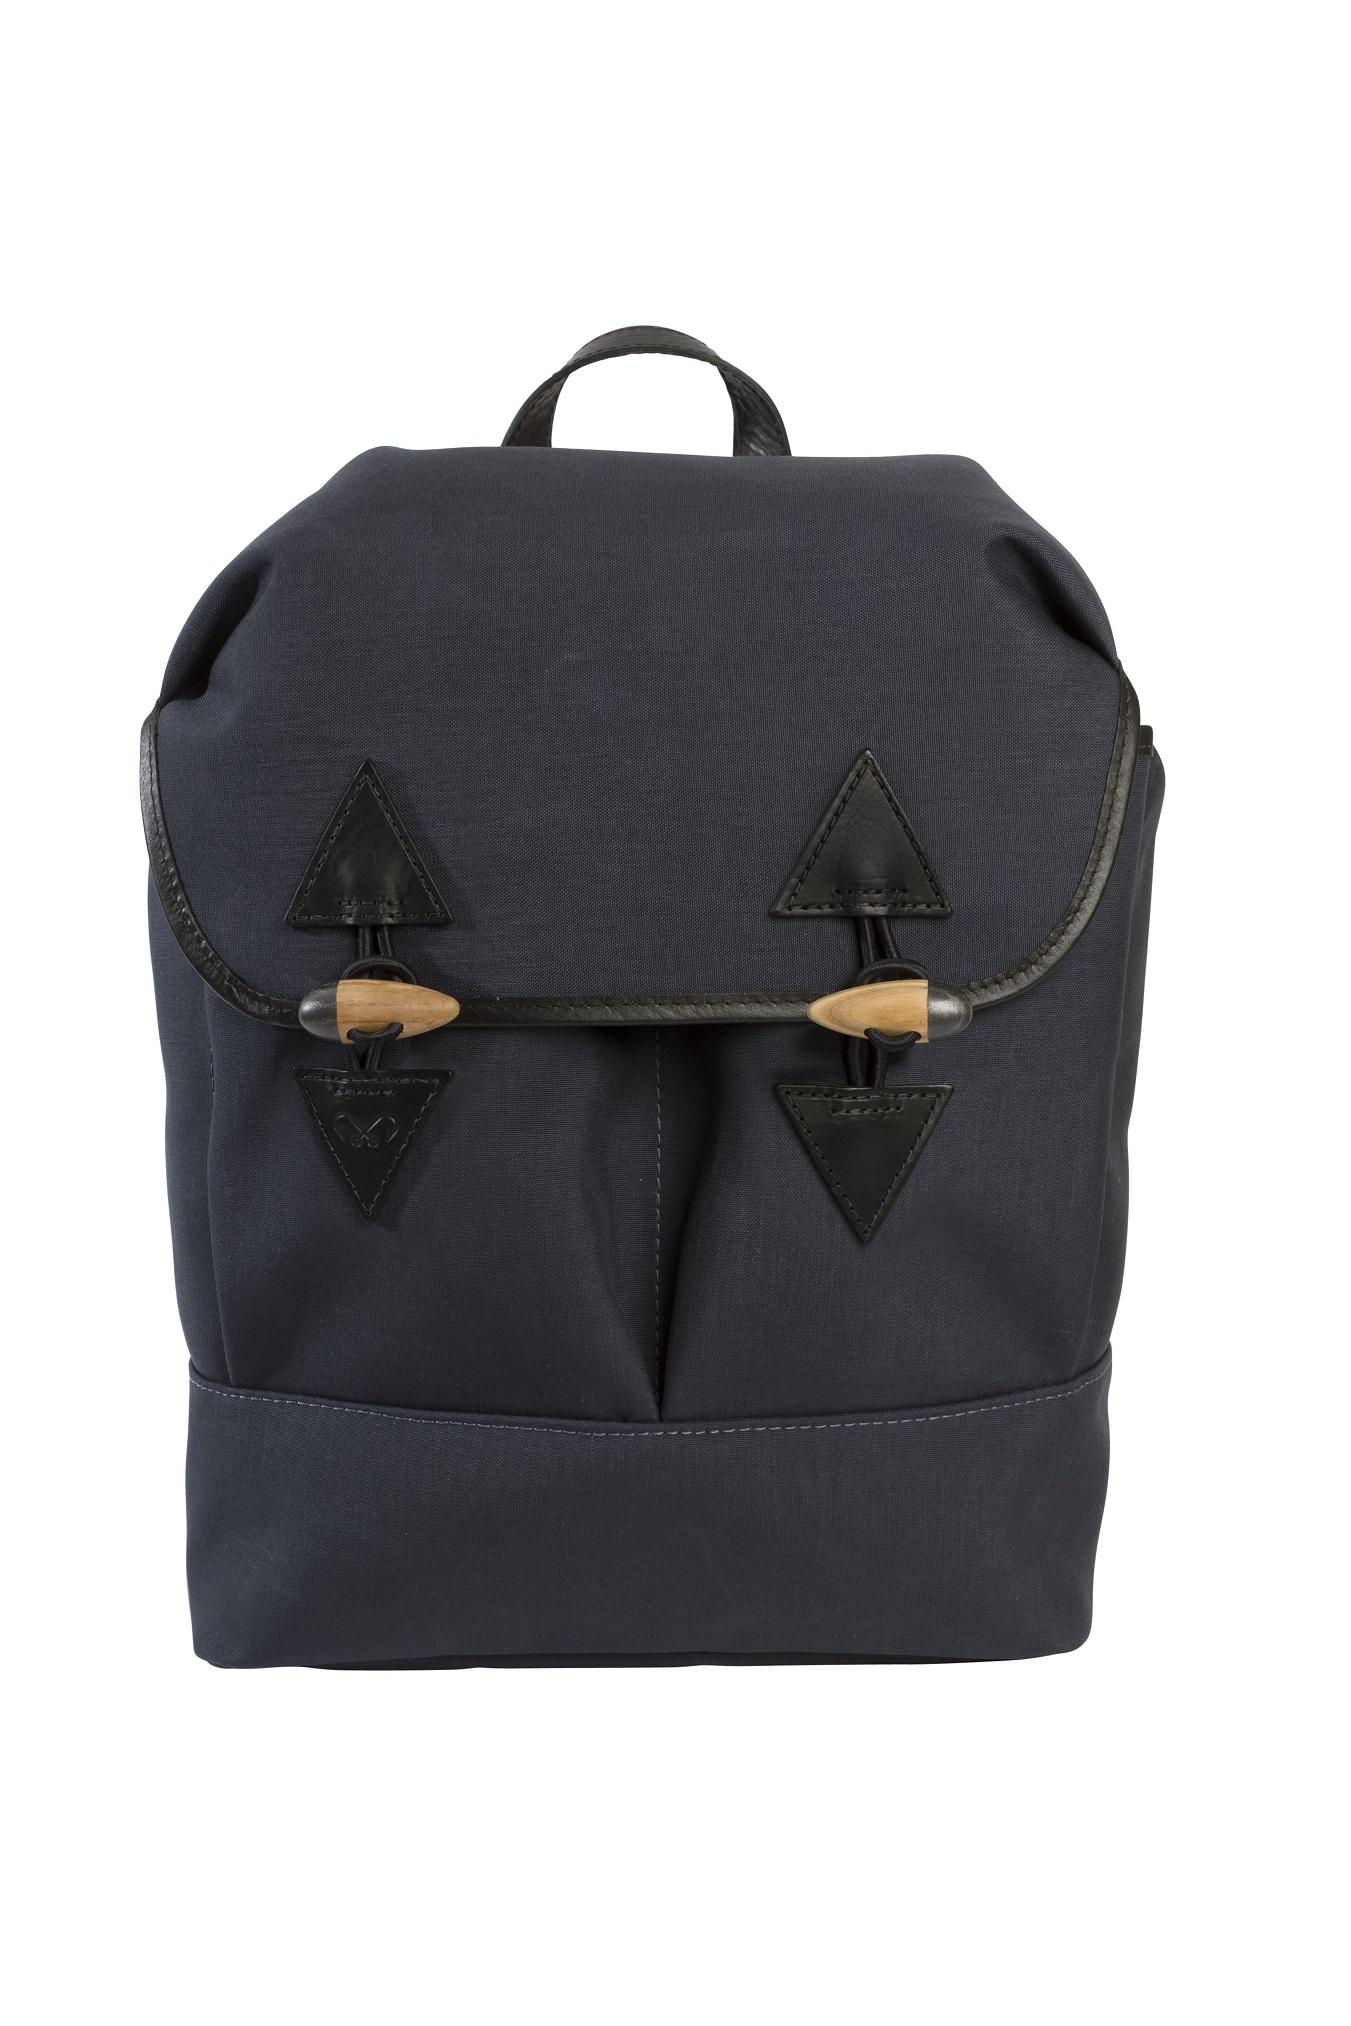 grey_rucksack_front (2)